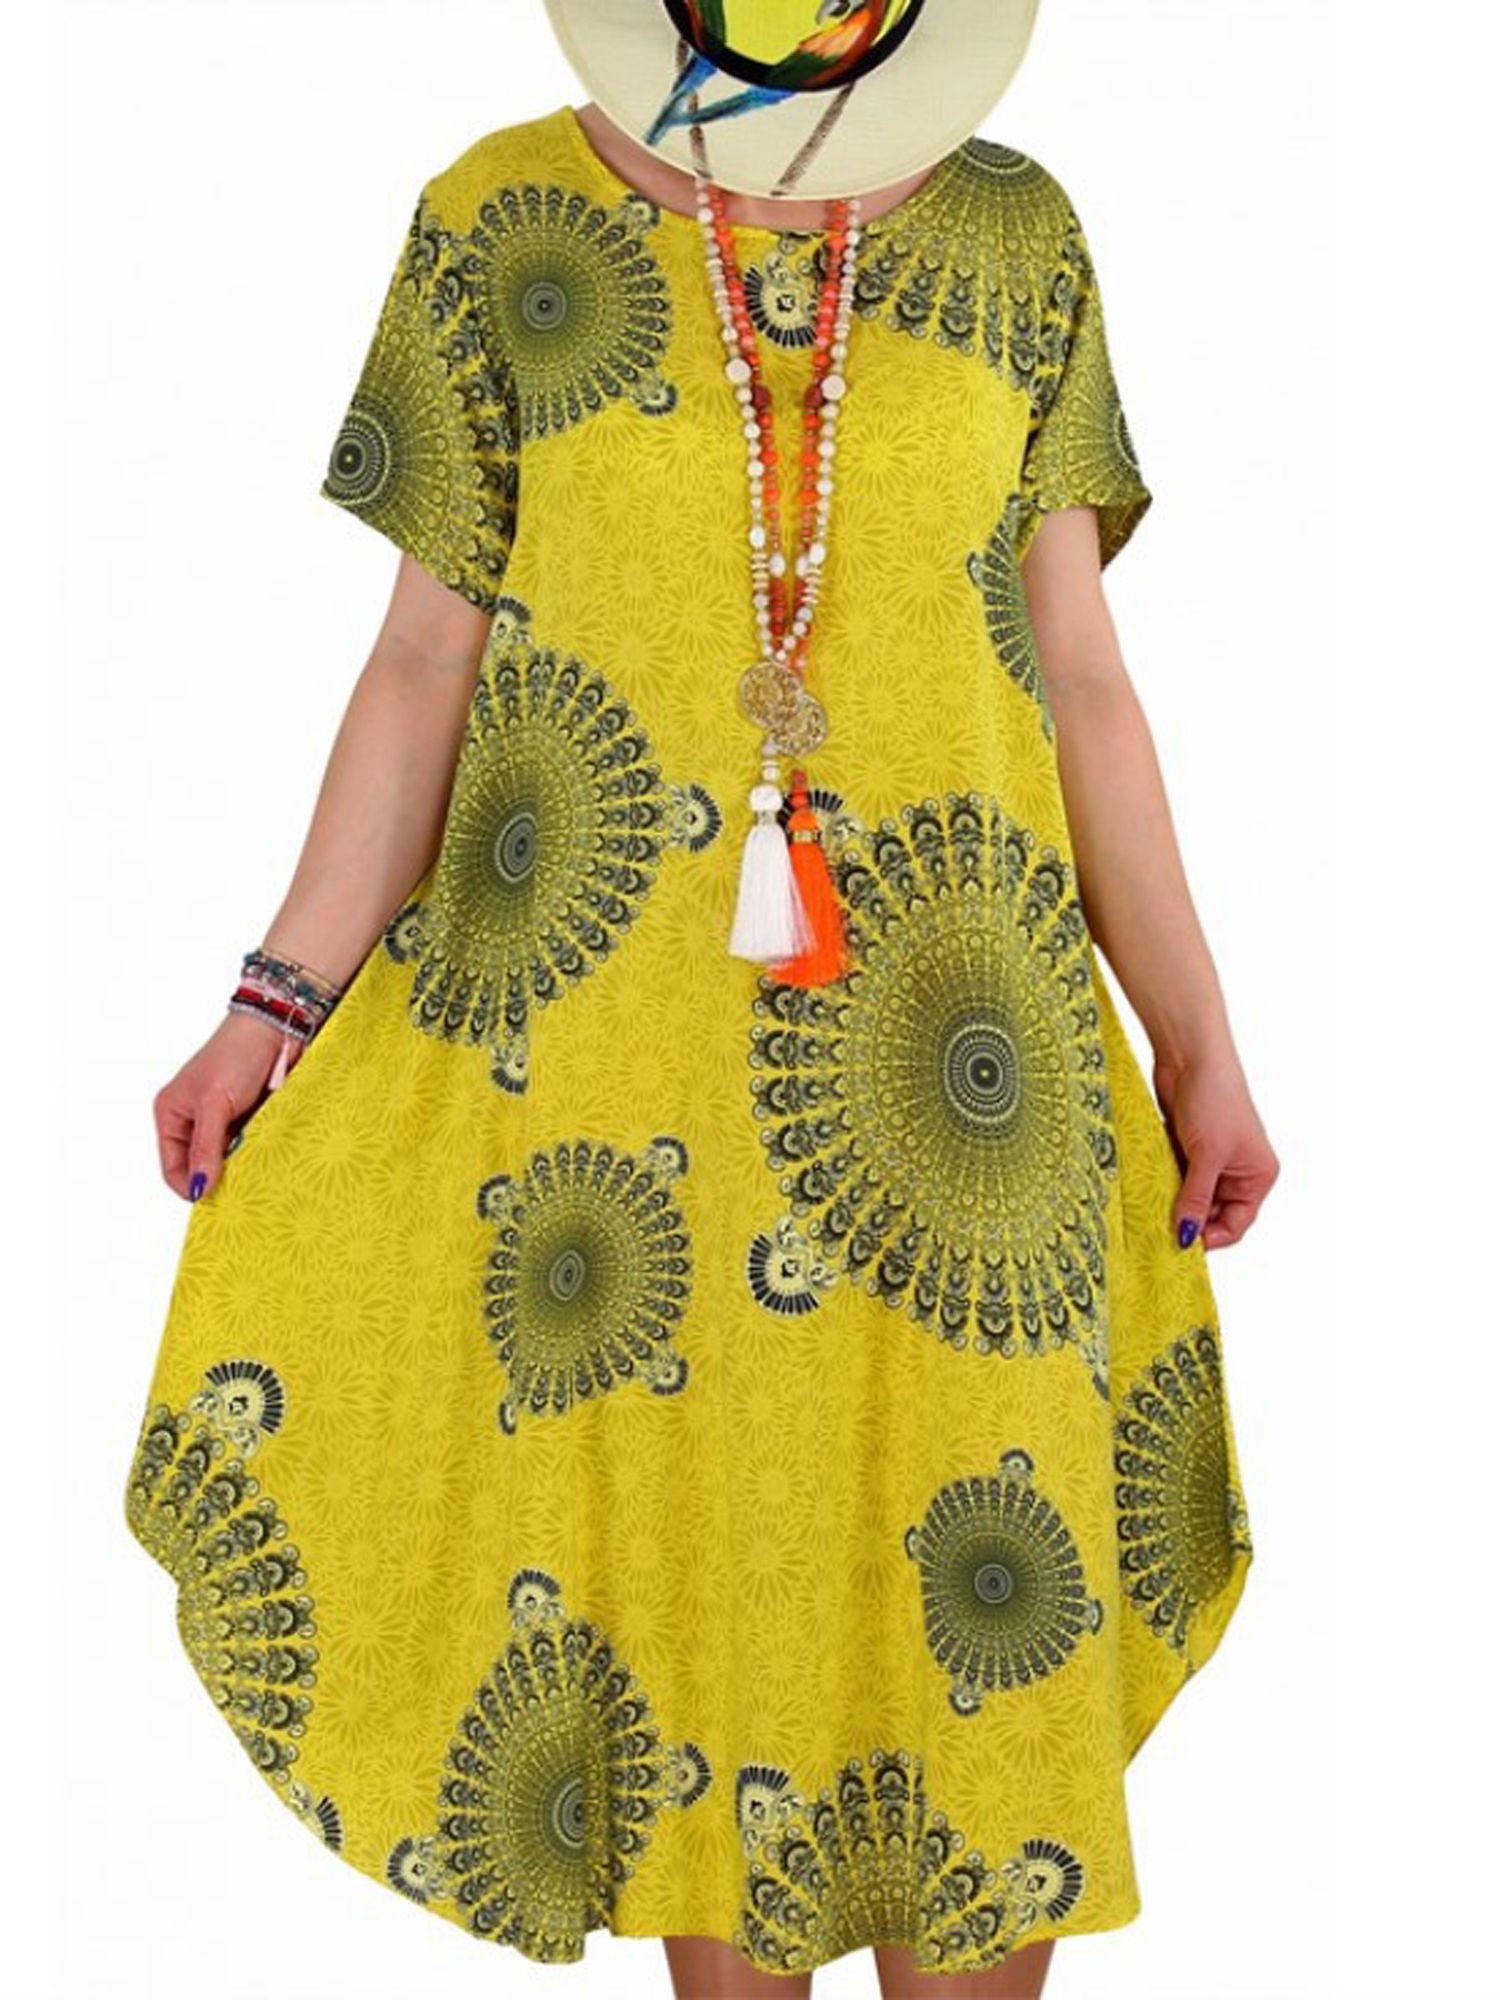 Lallc Plus Size Women Short Sleeve Floral Mini Dress Walmart Com Short Sleeve Dresses Color Block Tunics Casual Dresses For Women [ 2000 x 1500 Pixel ]